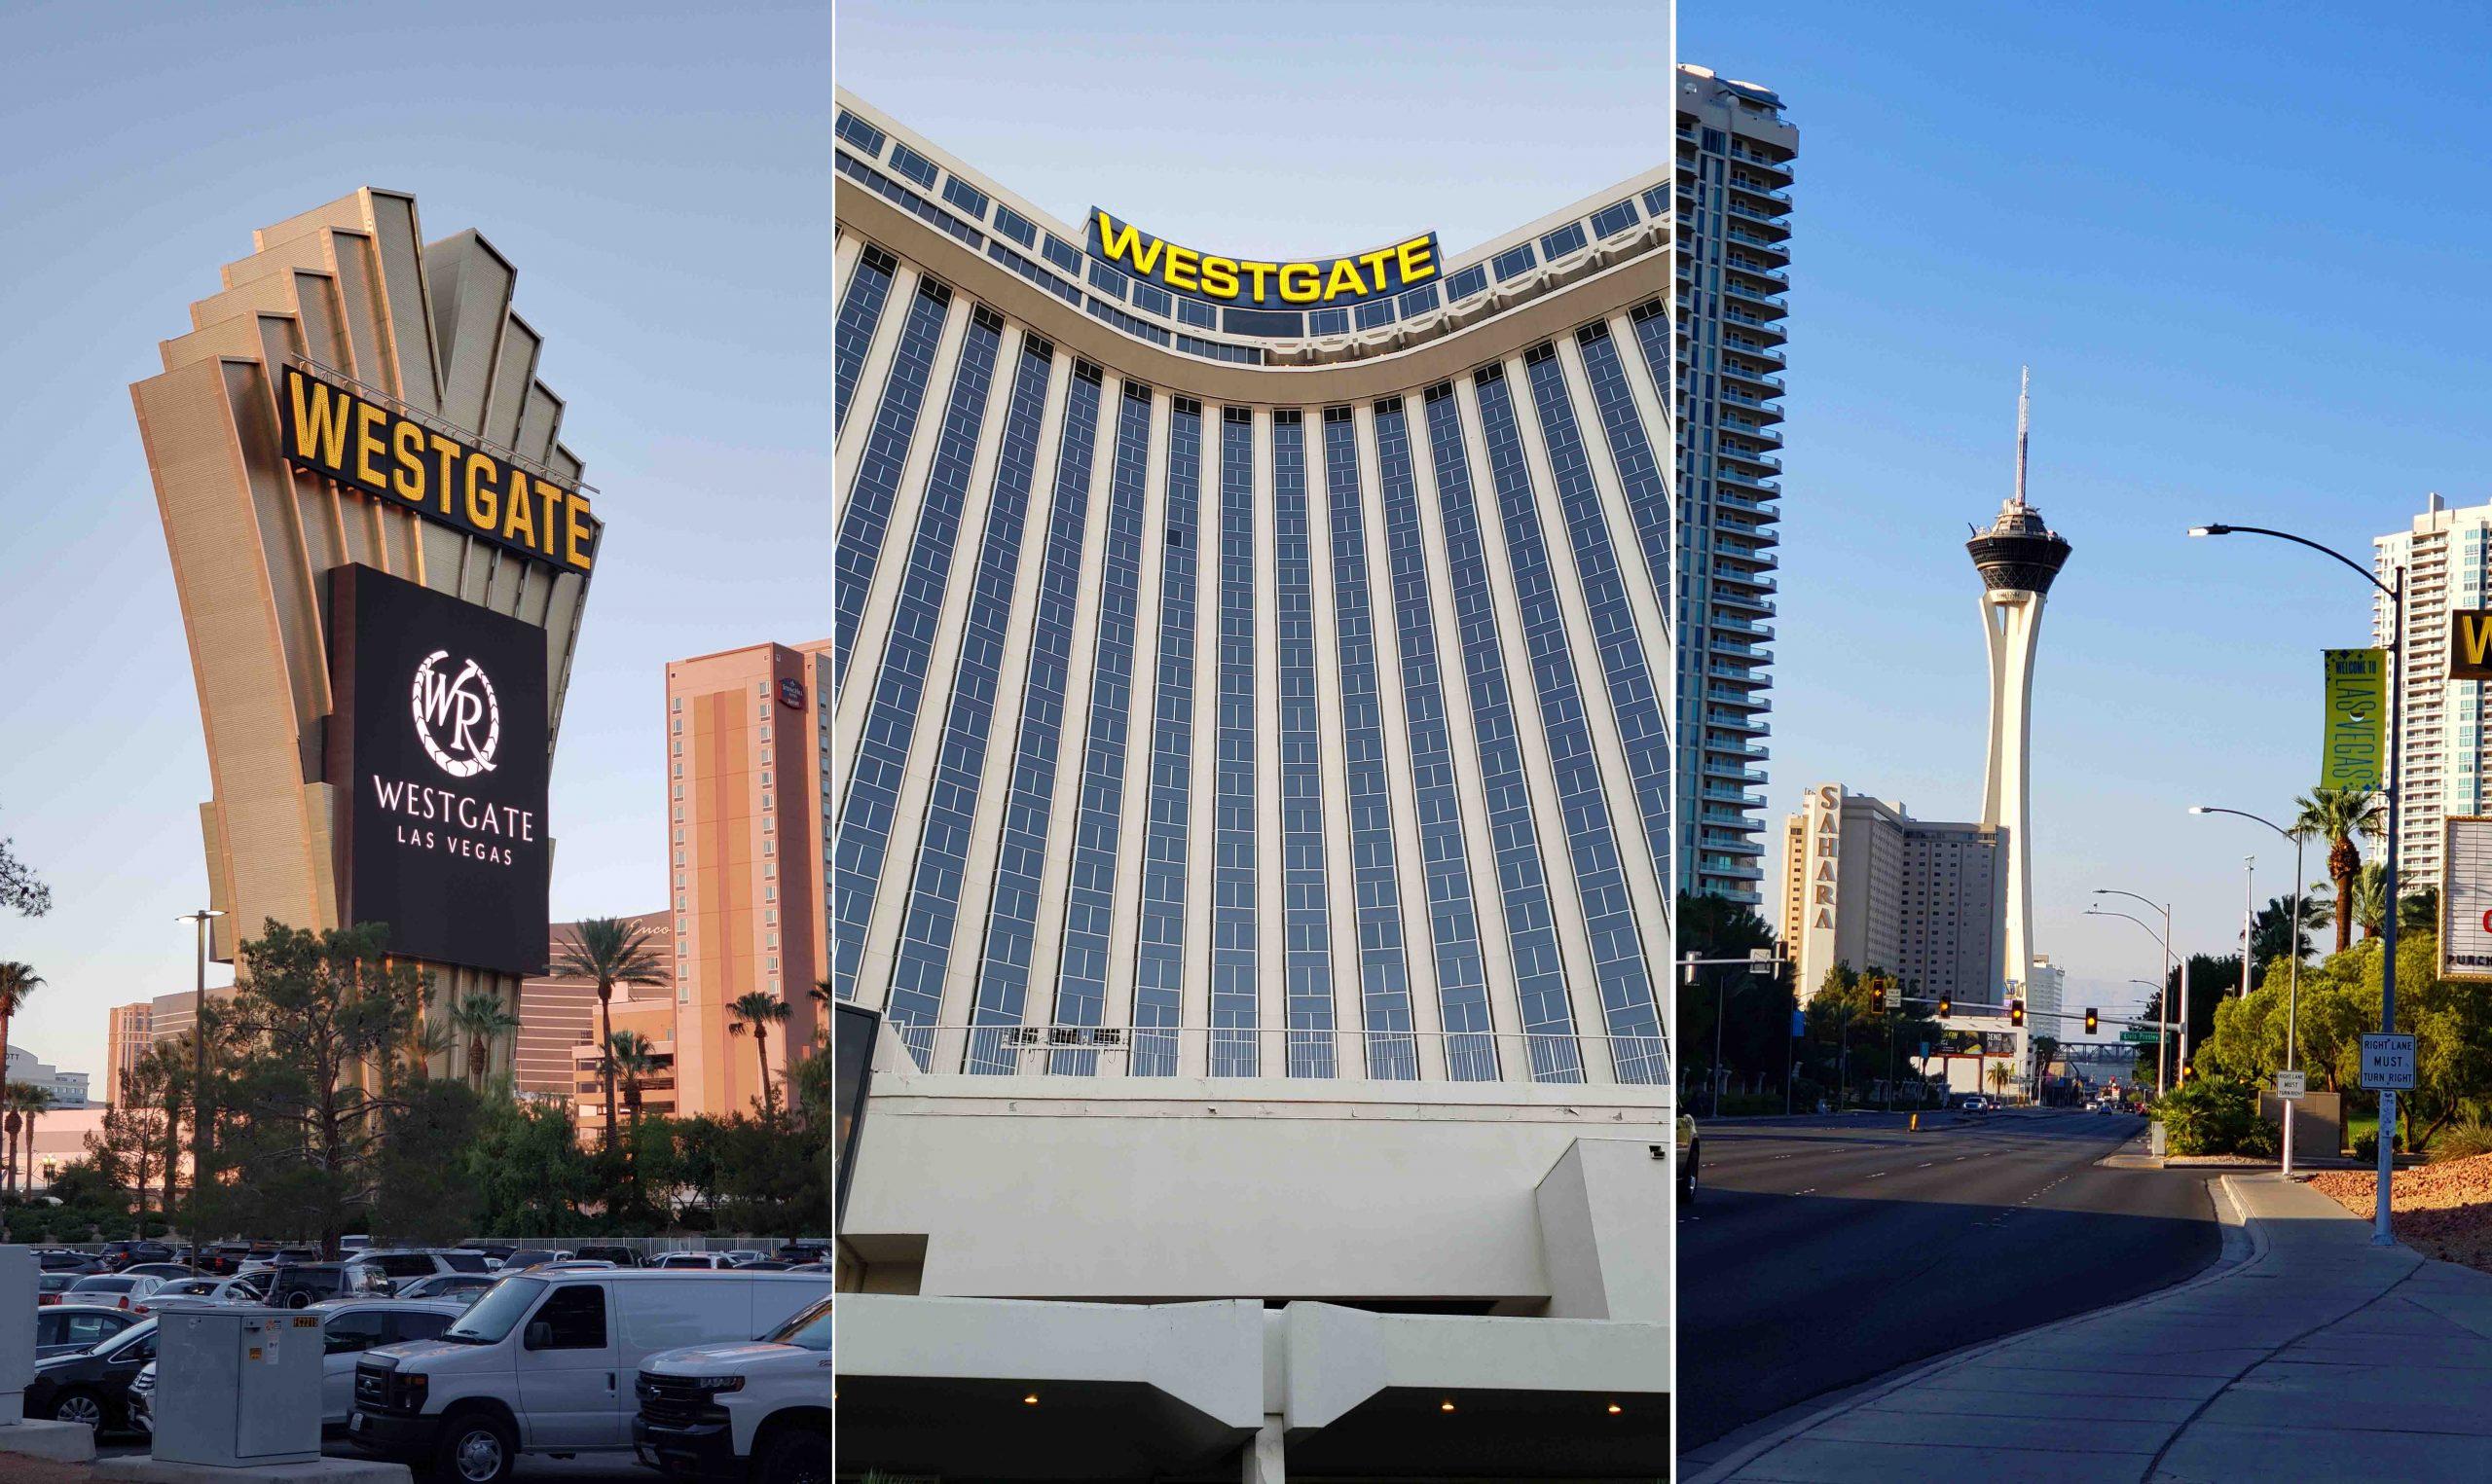 IPW Las Vegas